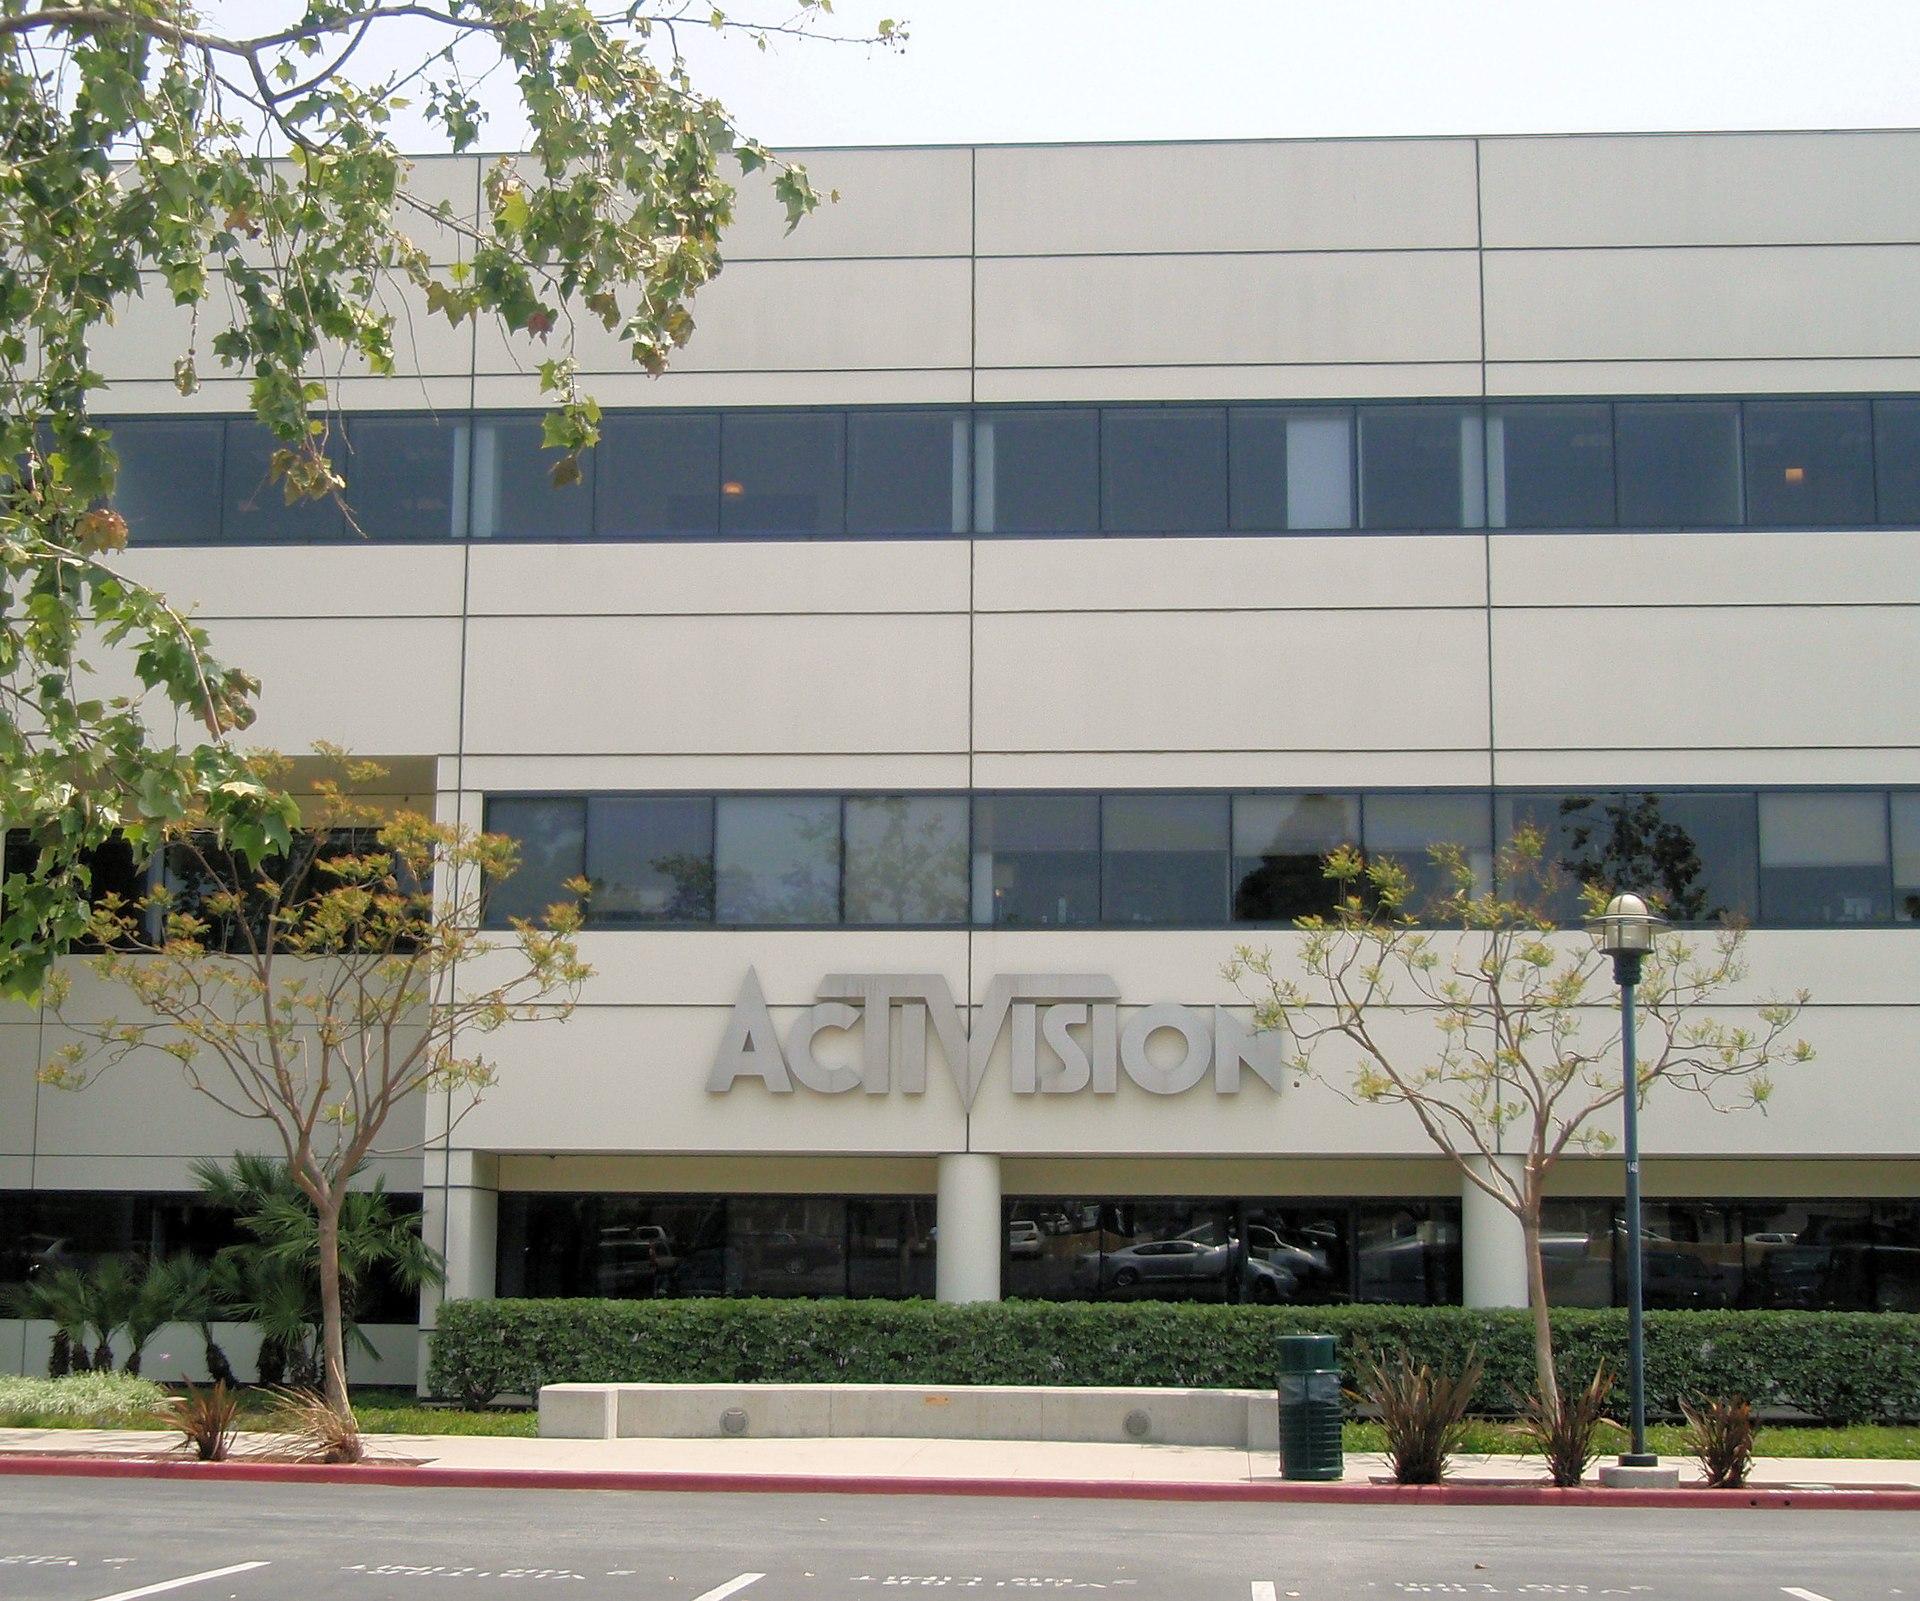 Activision - Wikipedia